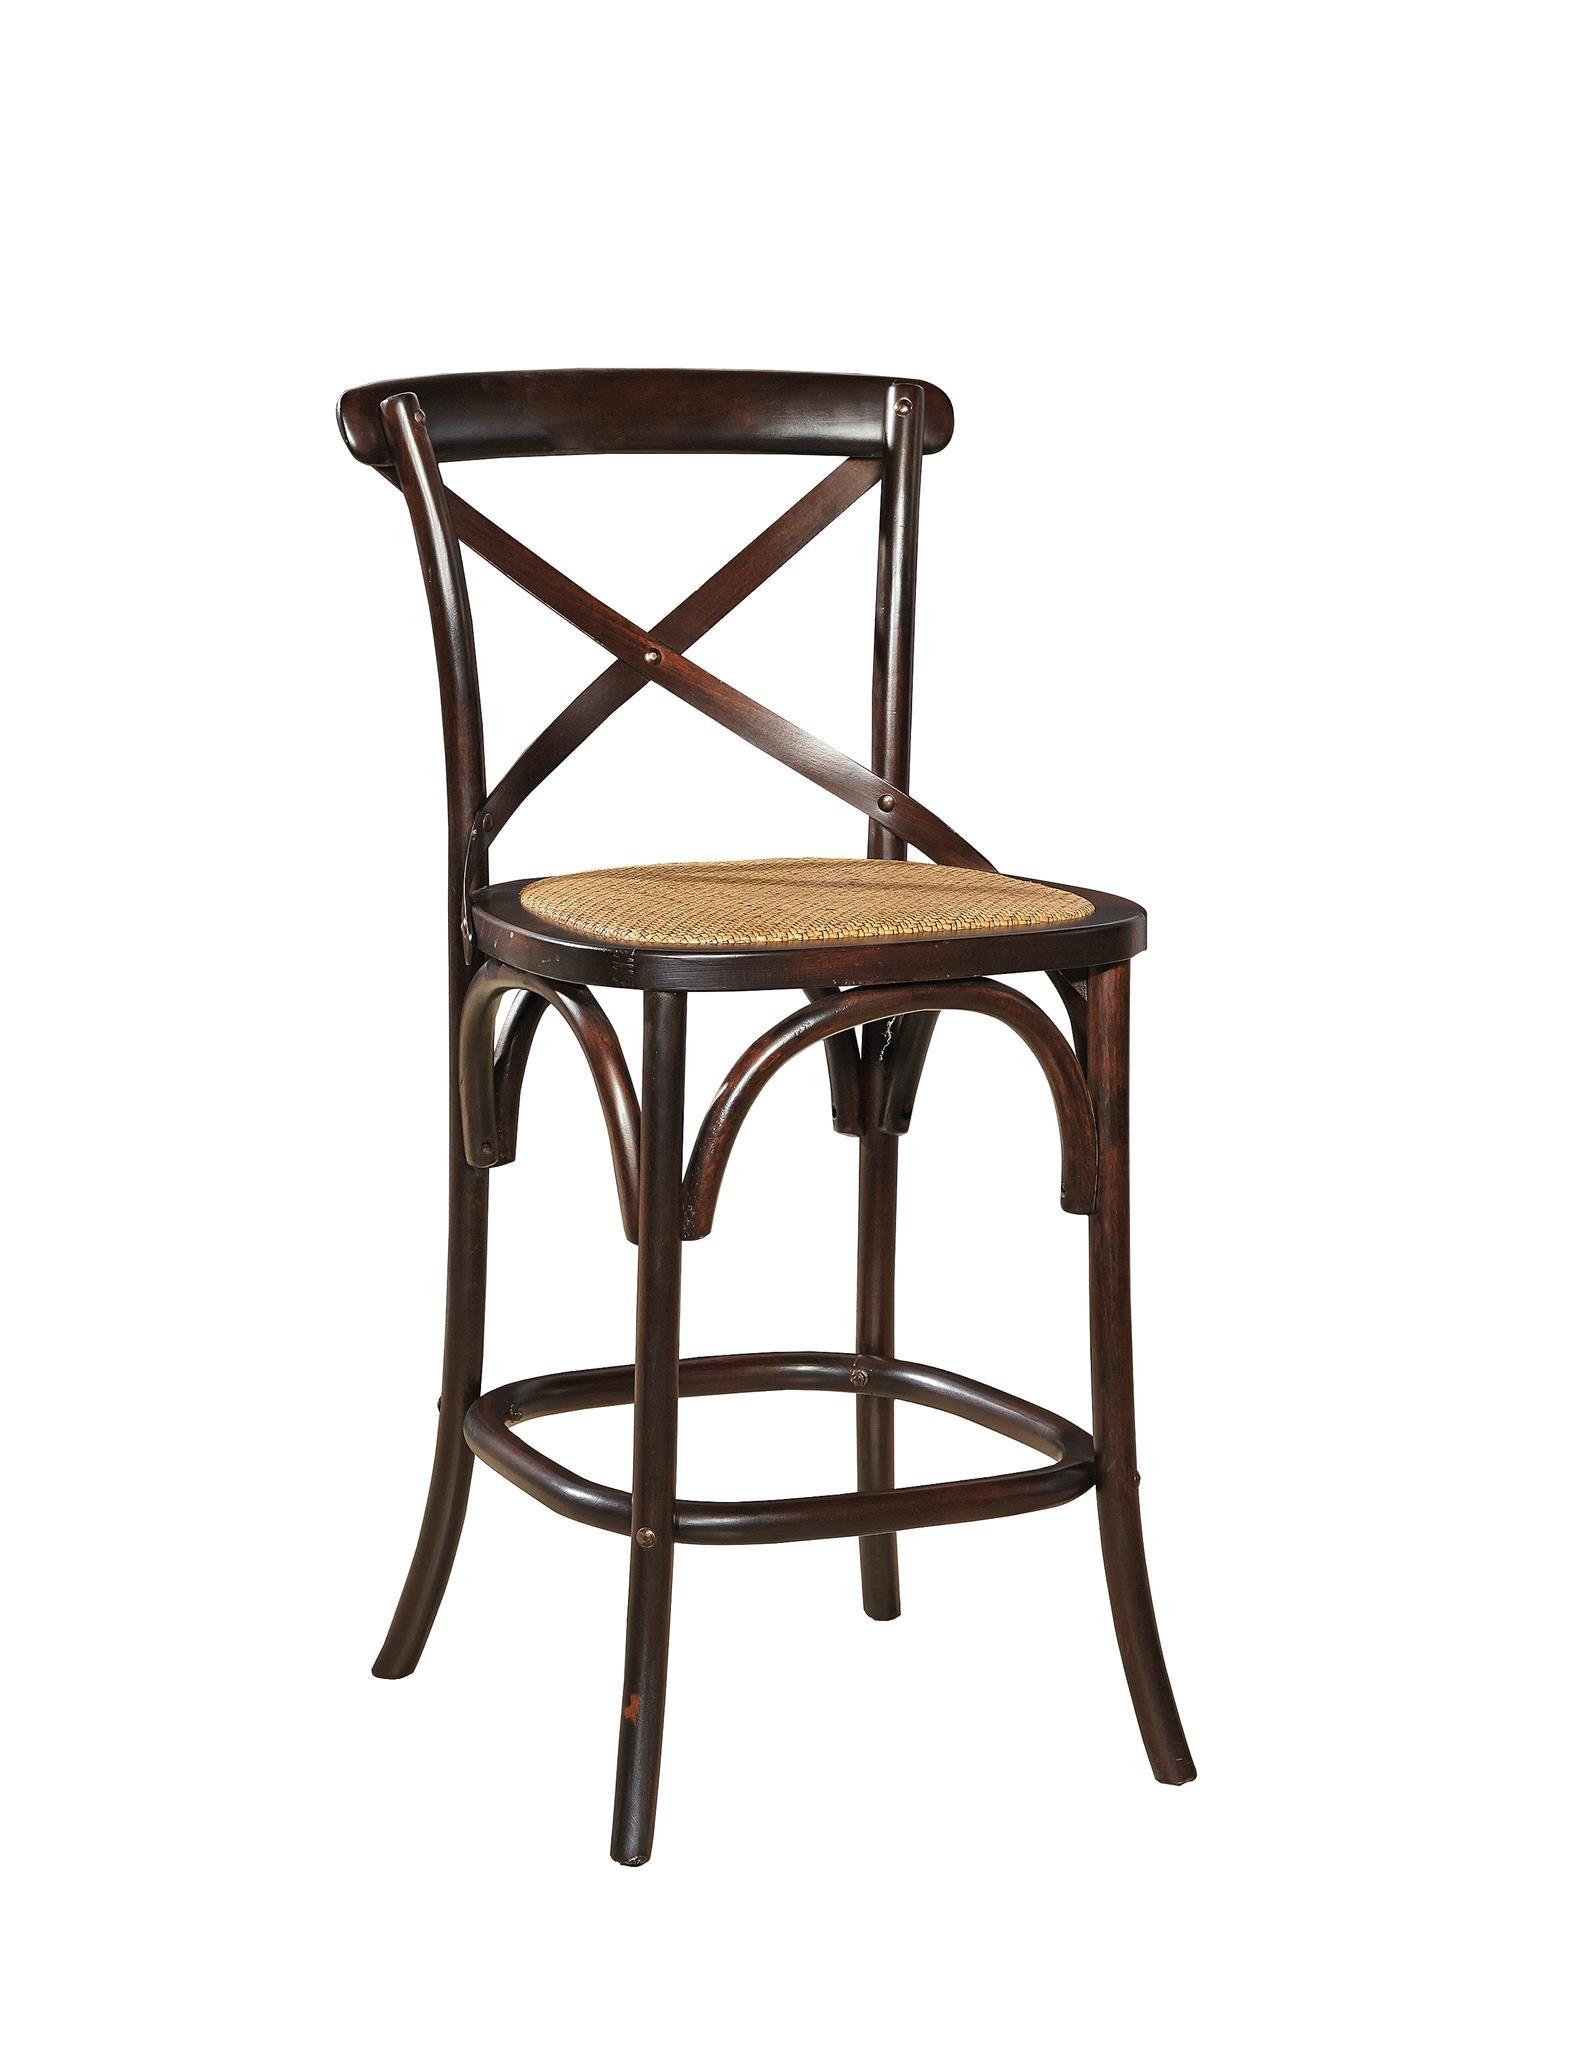 Furniture Classics, LTD Bentwood Counter Stool 521438